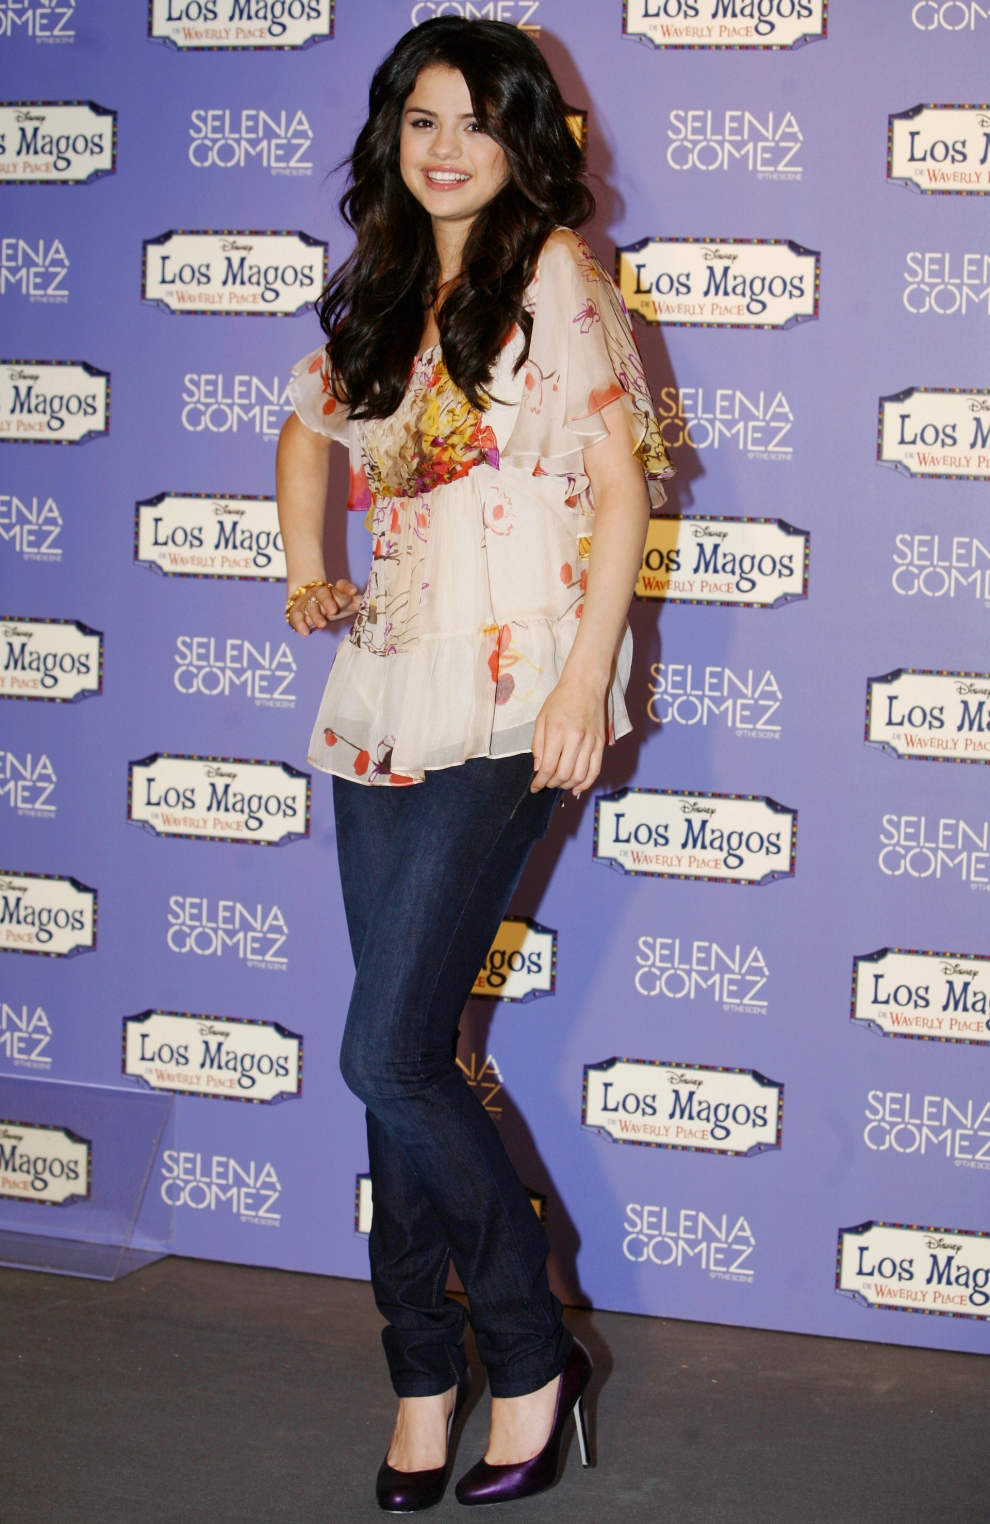 Selena gomez - promocja p142yty